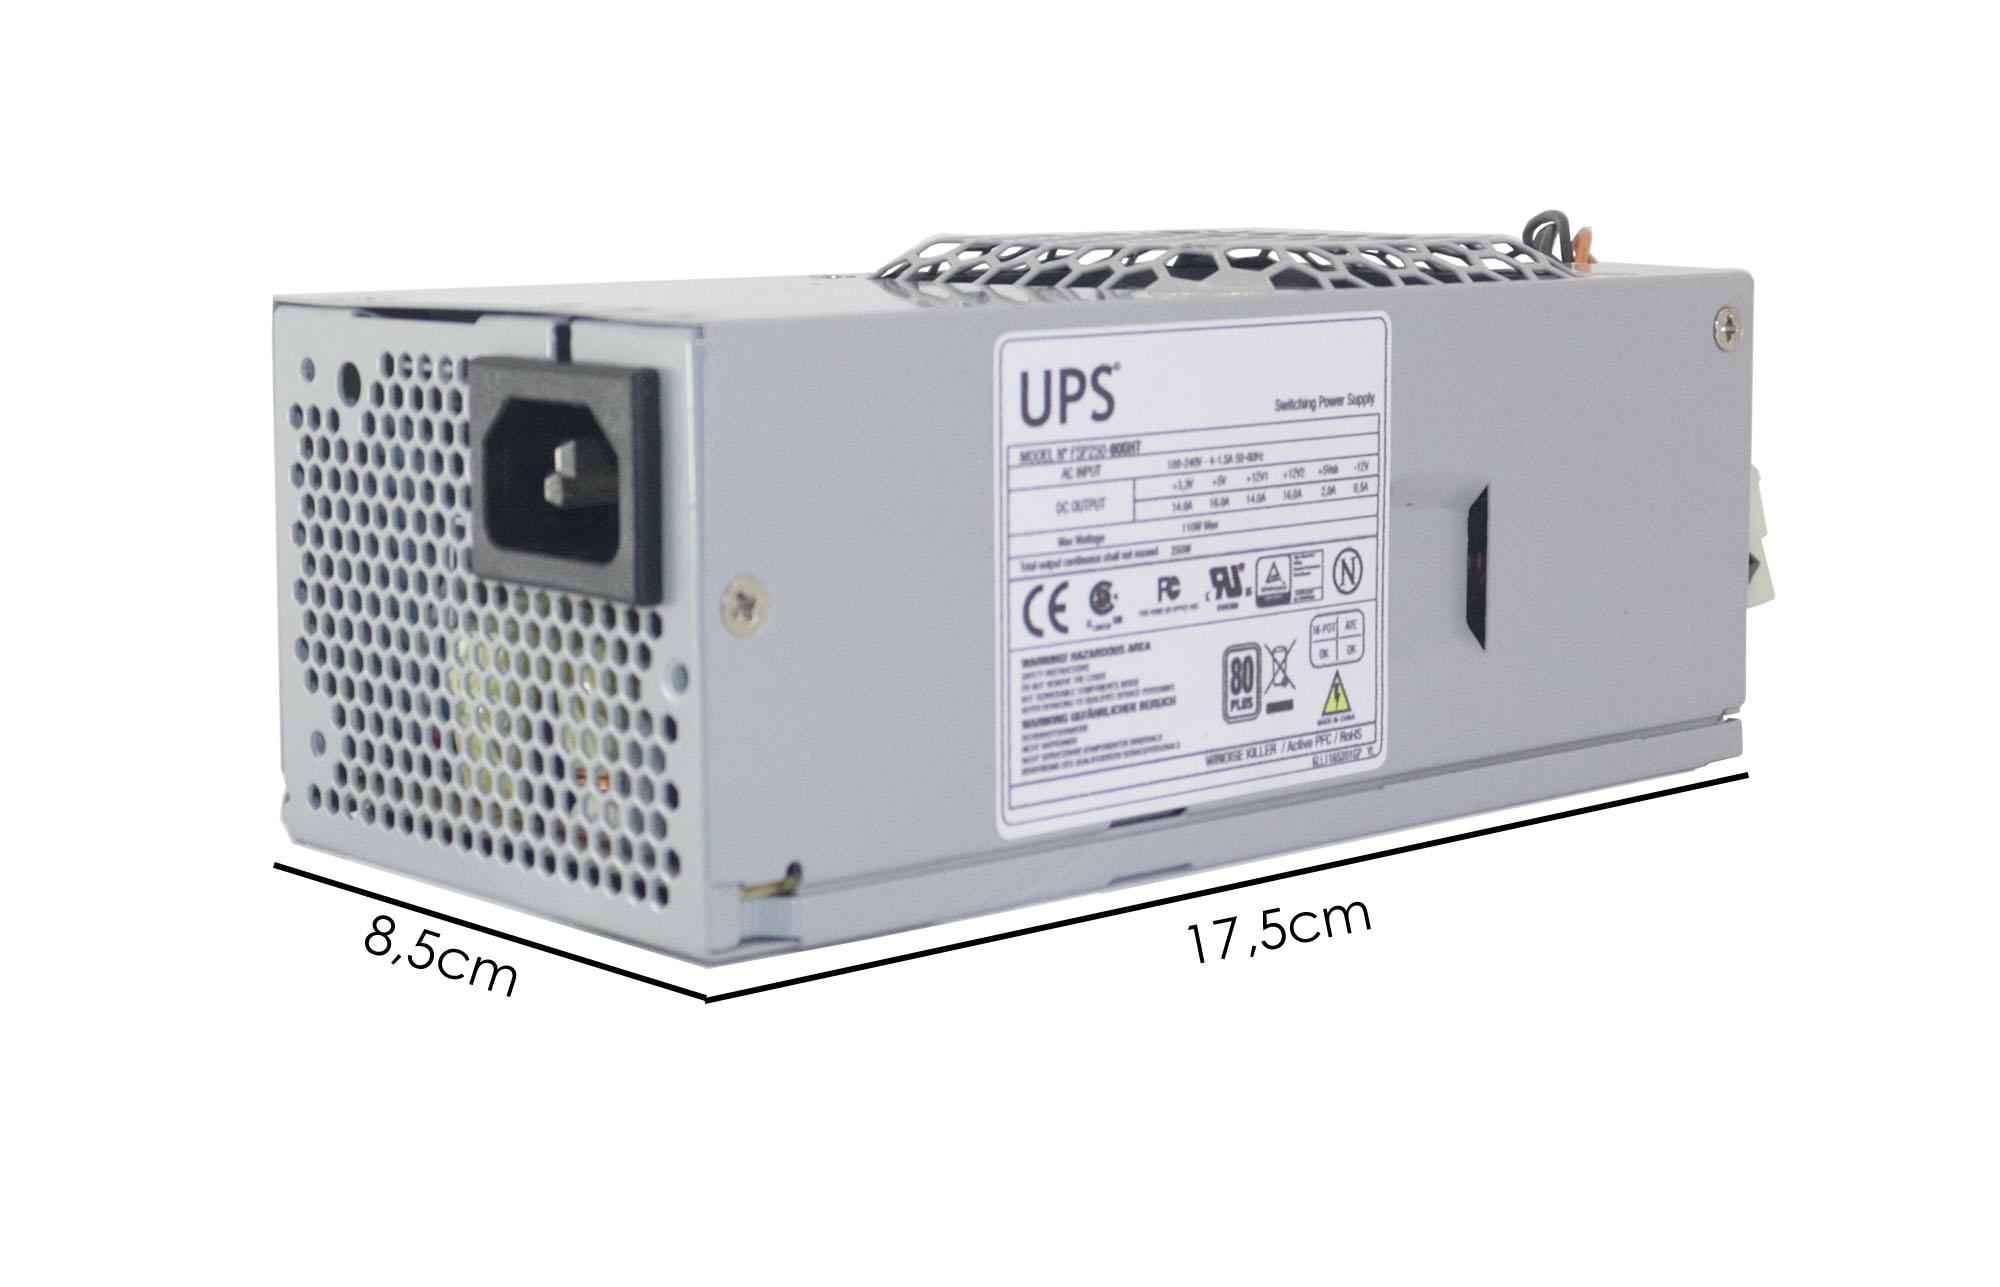 Fonte Slim P/ Lenovo Thinkcentre M70e M76 M91 M81 M71 M91p